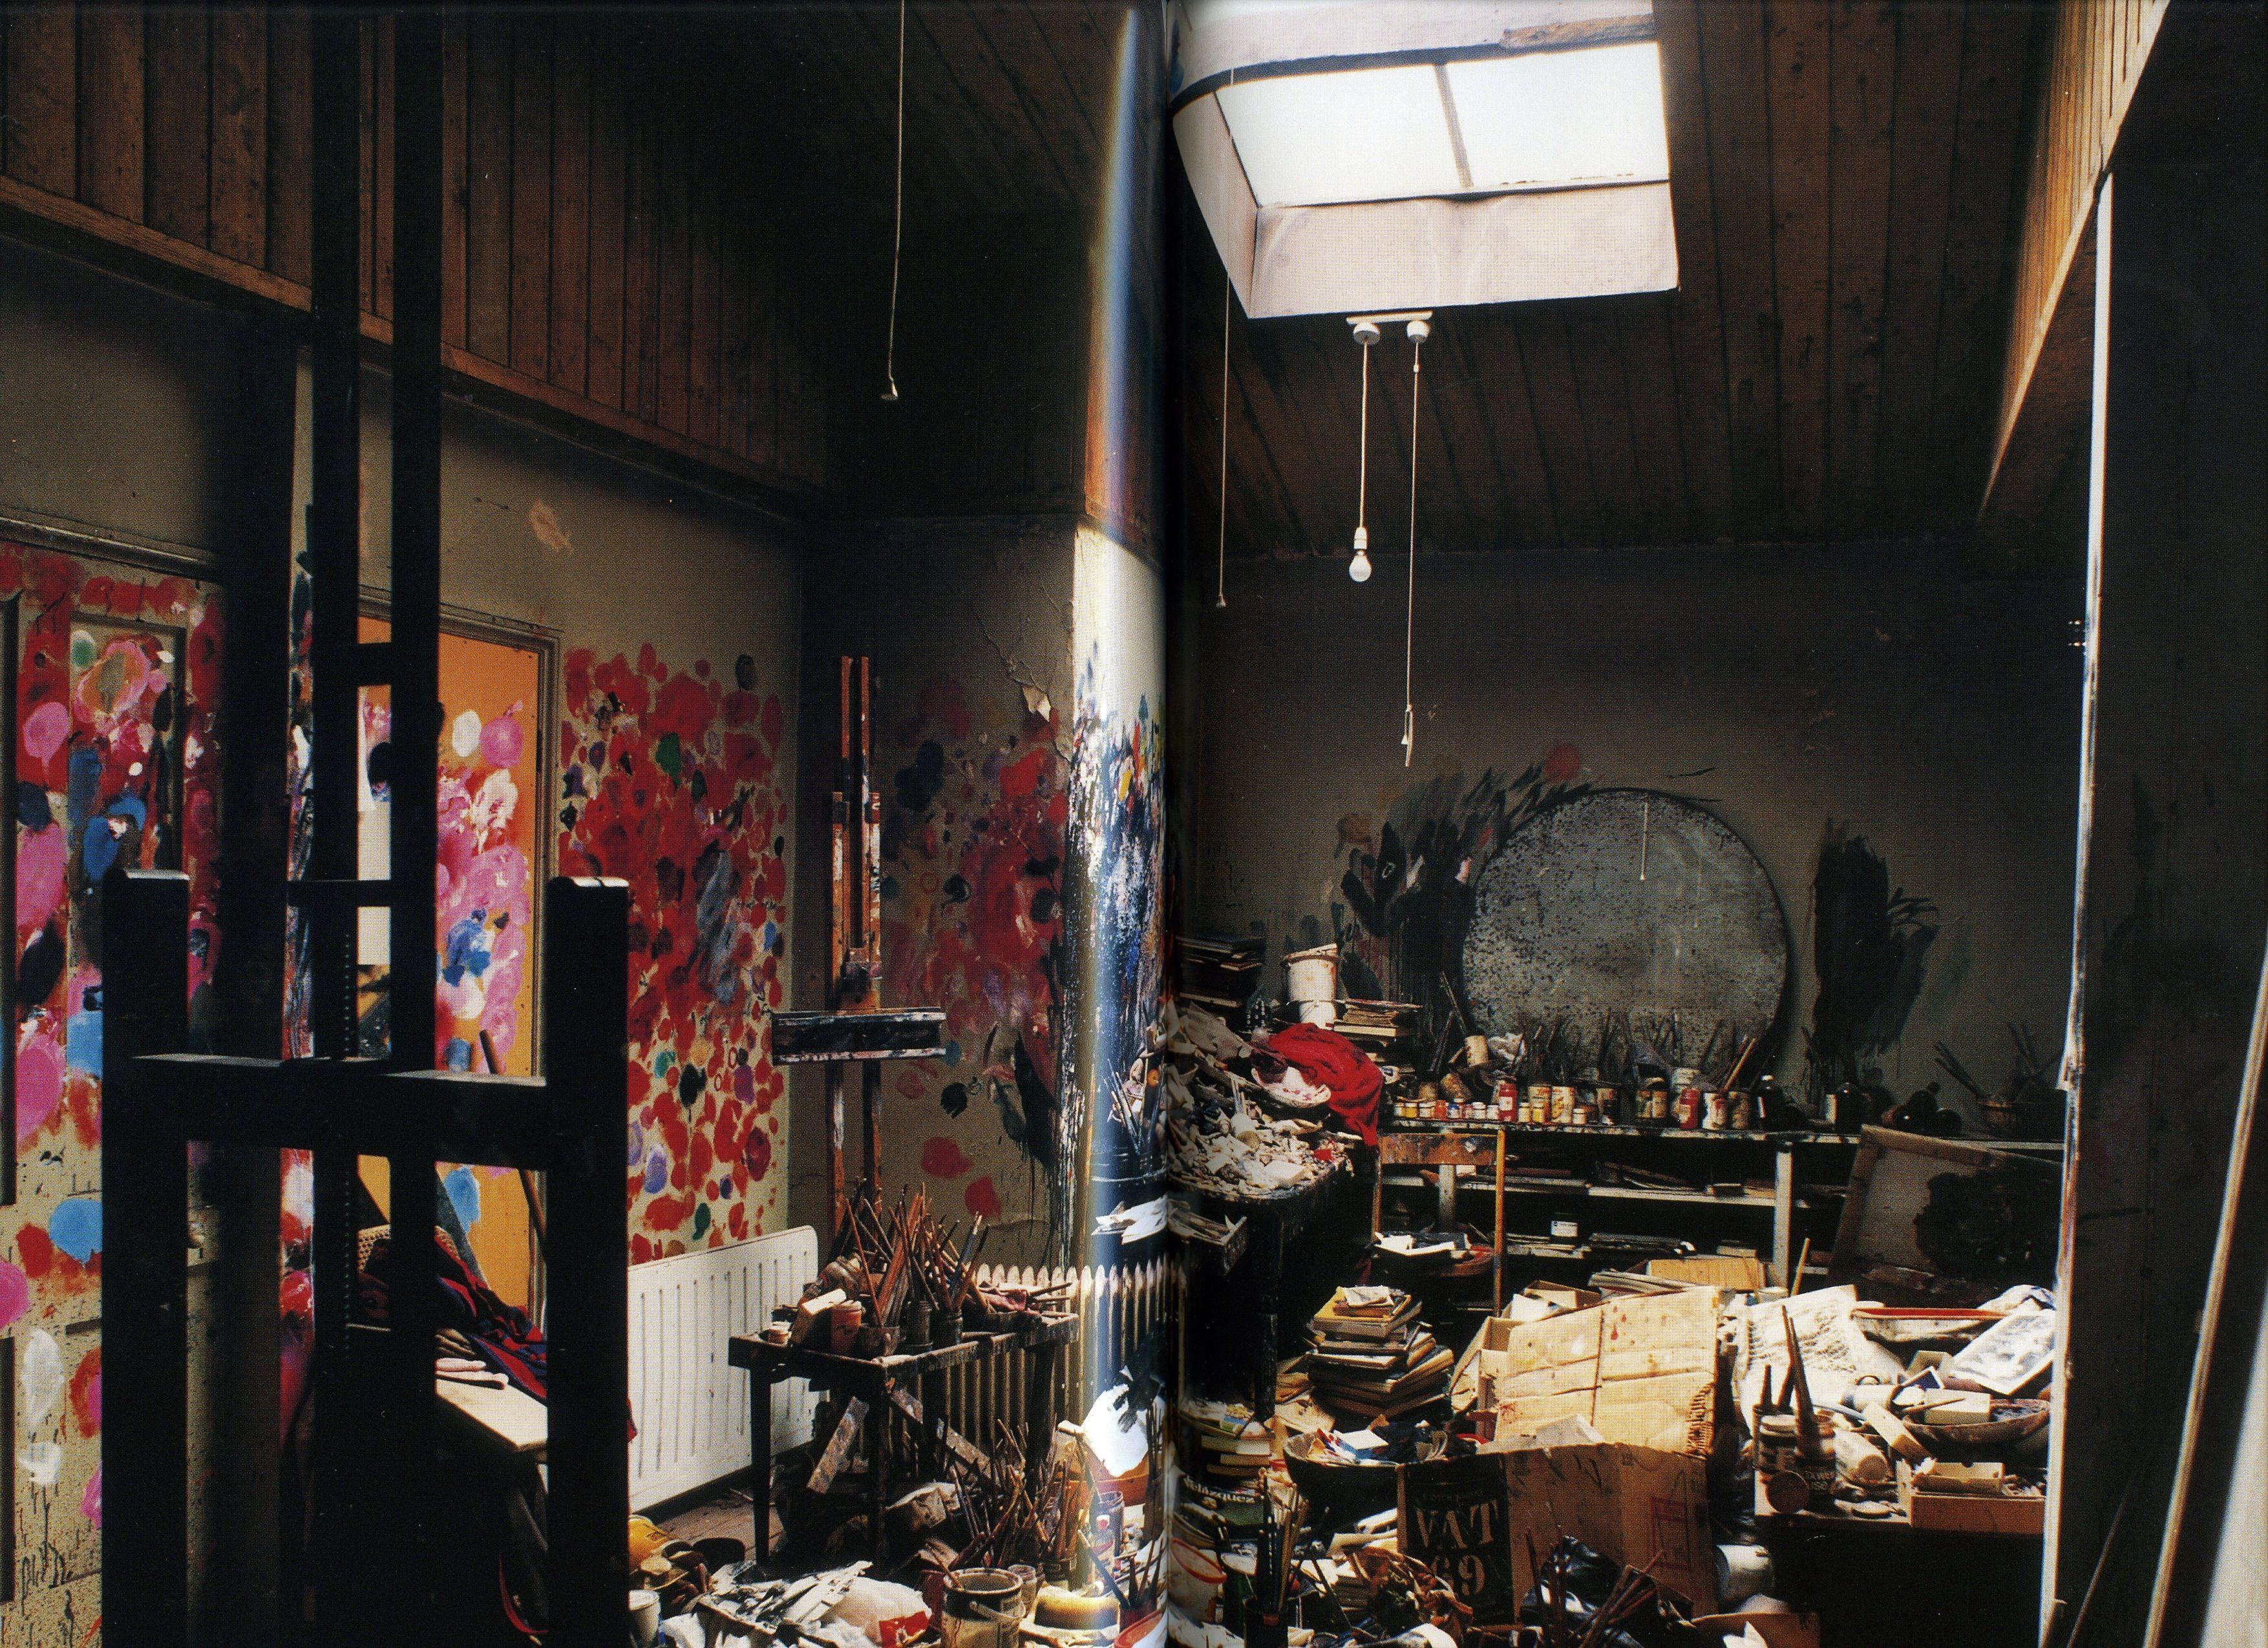 7 Reece Mews in South Kensington, London Francis Bacon's